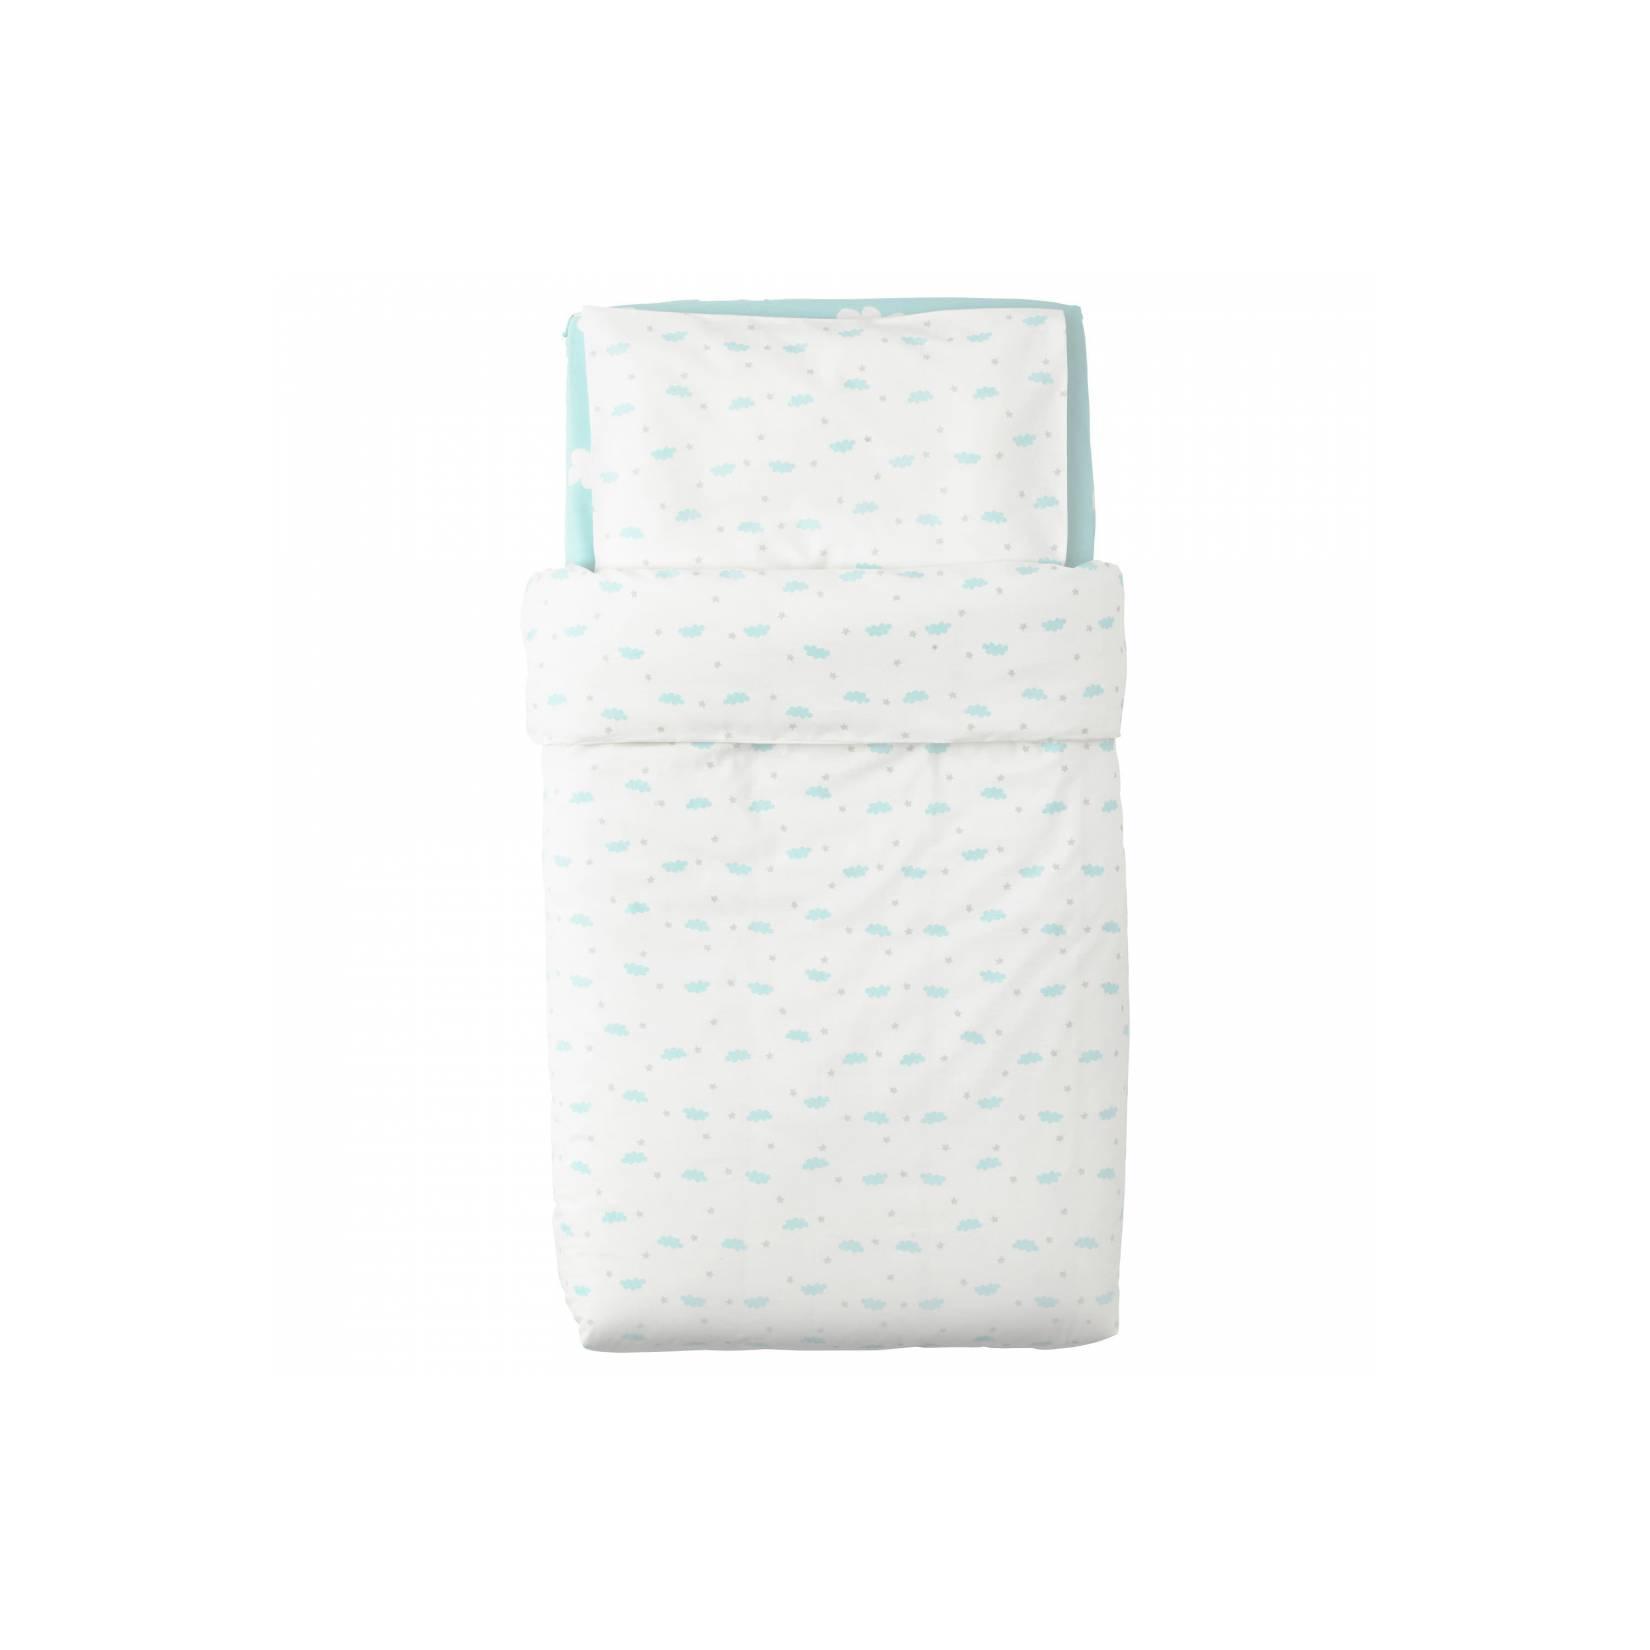 Harga Sprei Ikea Terbaru 2018 Knoppa Seprai Berkaret Putih Ukuran 90x200 Cm Himmelsk Untuk Ranjang Bayi Biru Muda